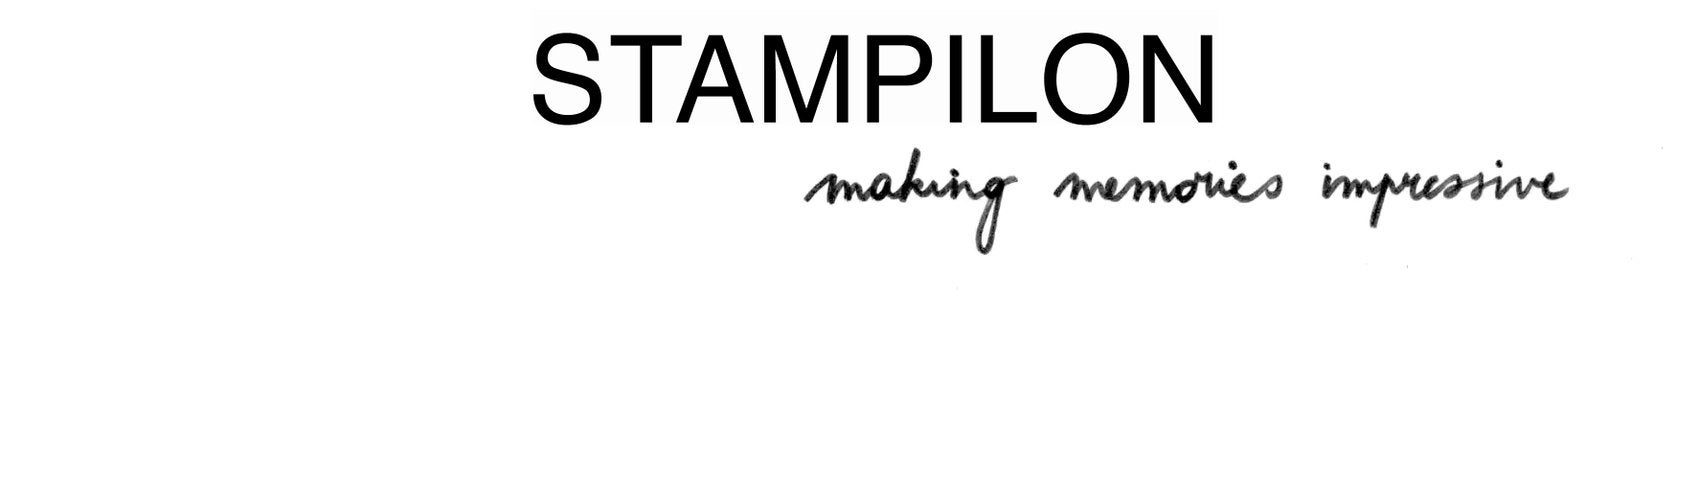 stampilon